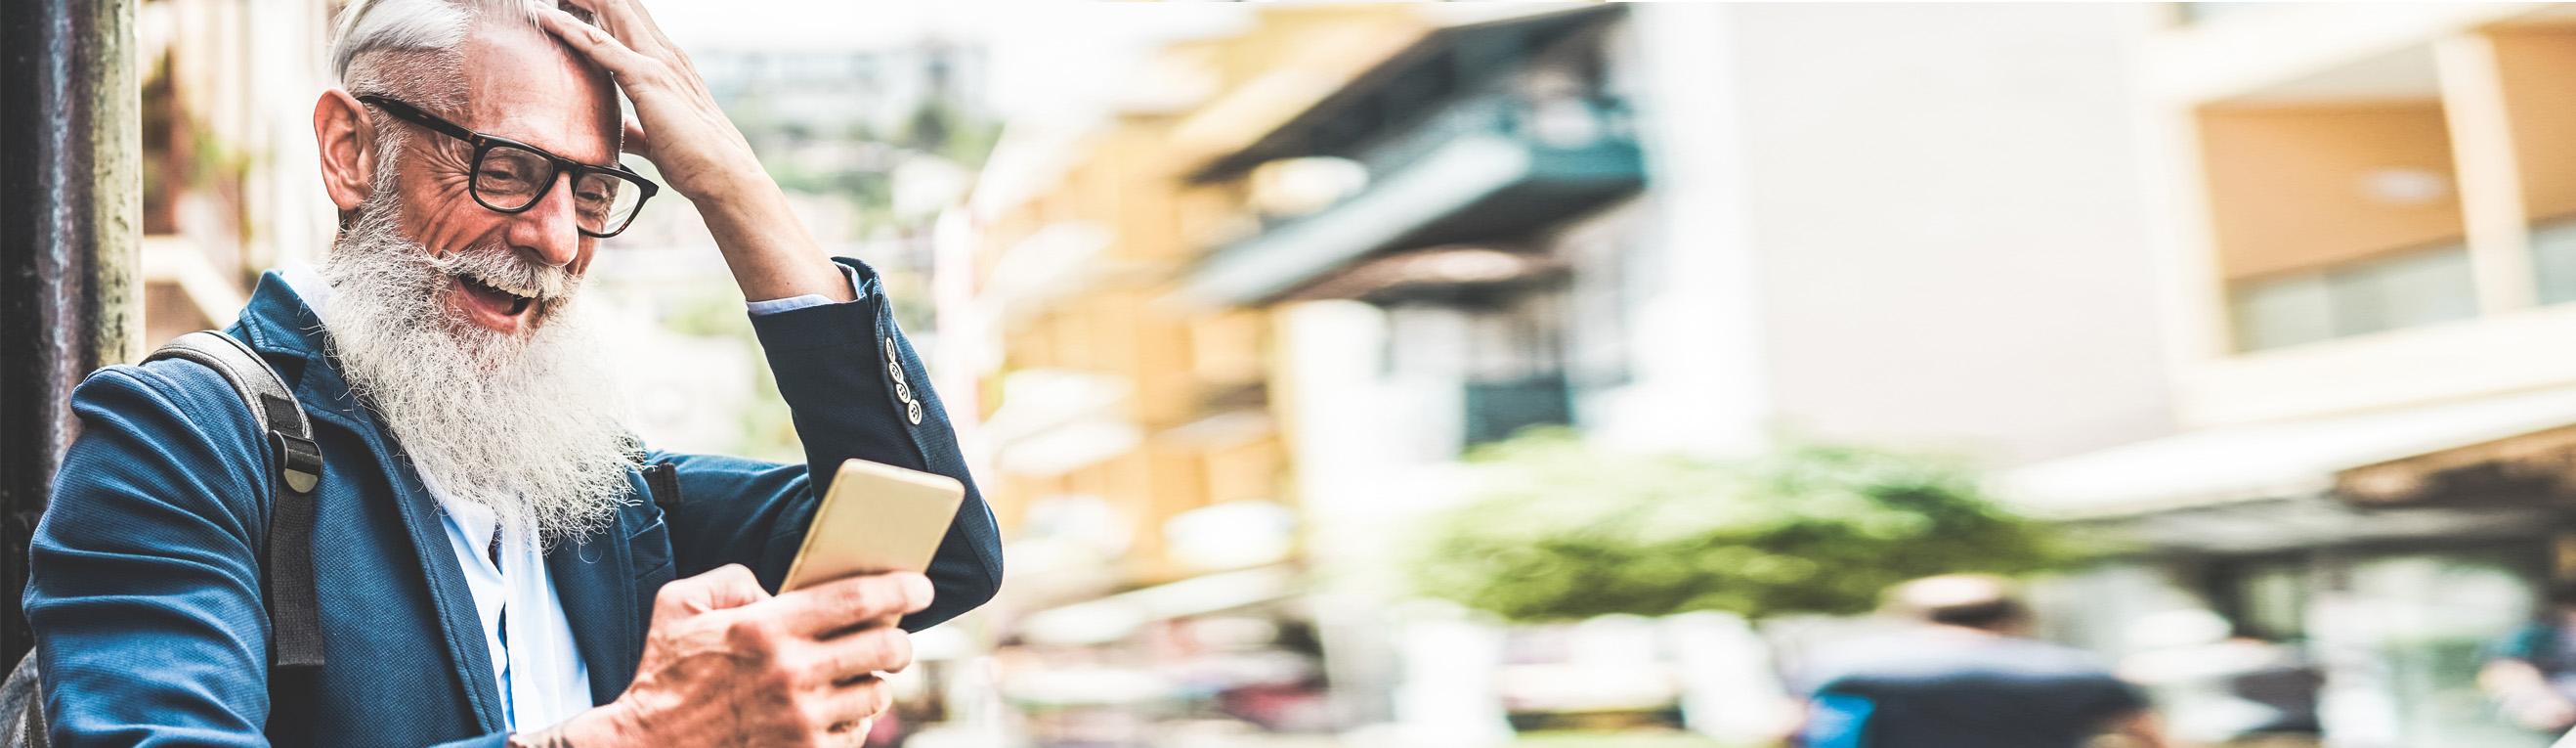 VR-Banking App - mobiles Banking unterwegs